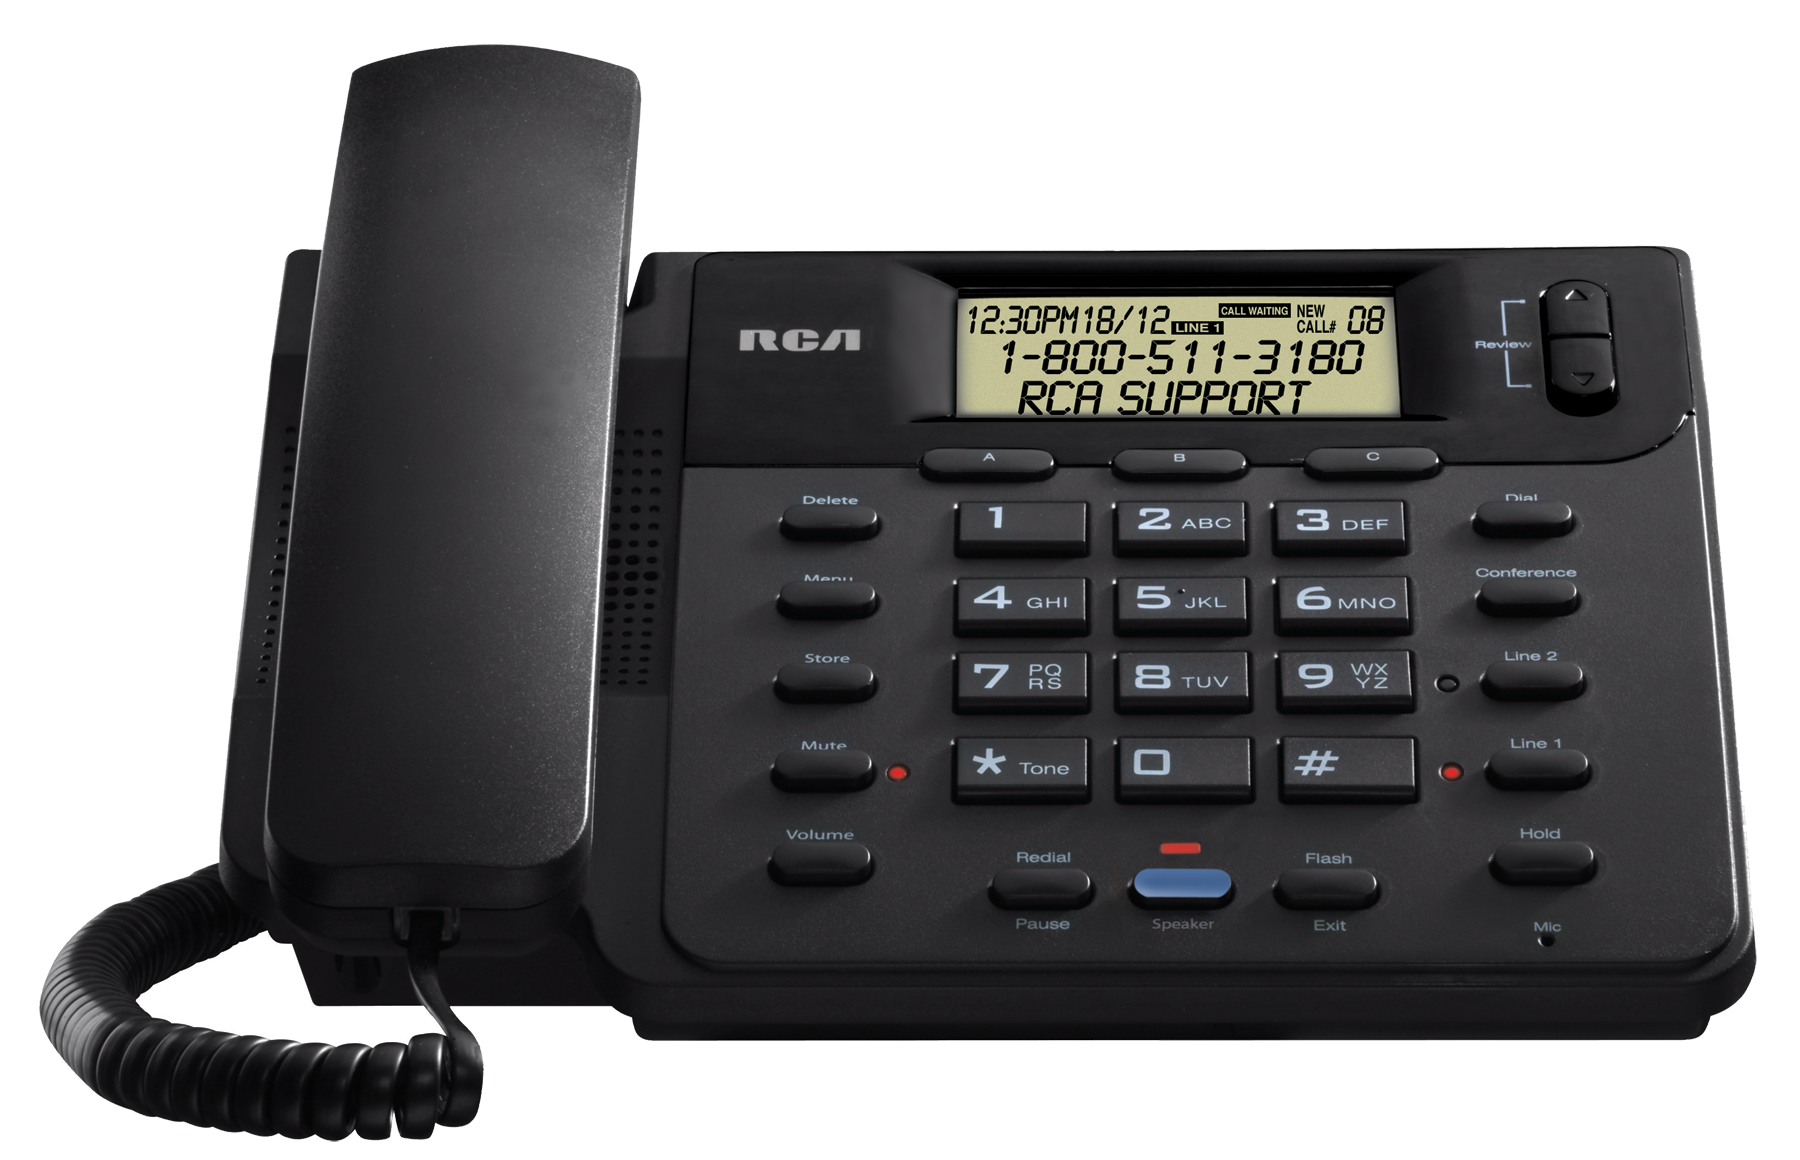 Landline Phone PNG Image File.